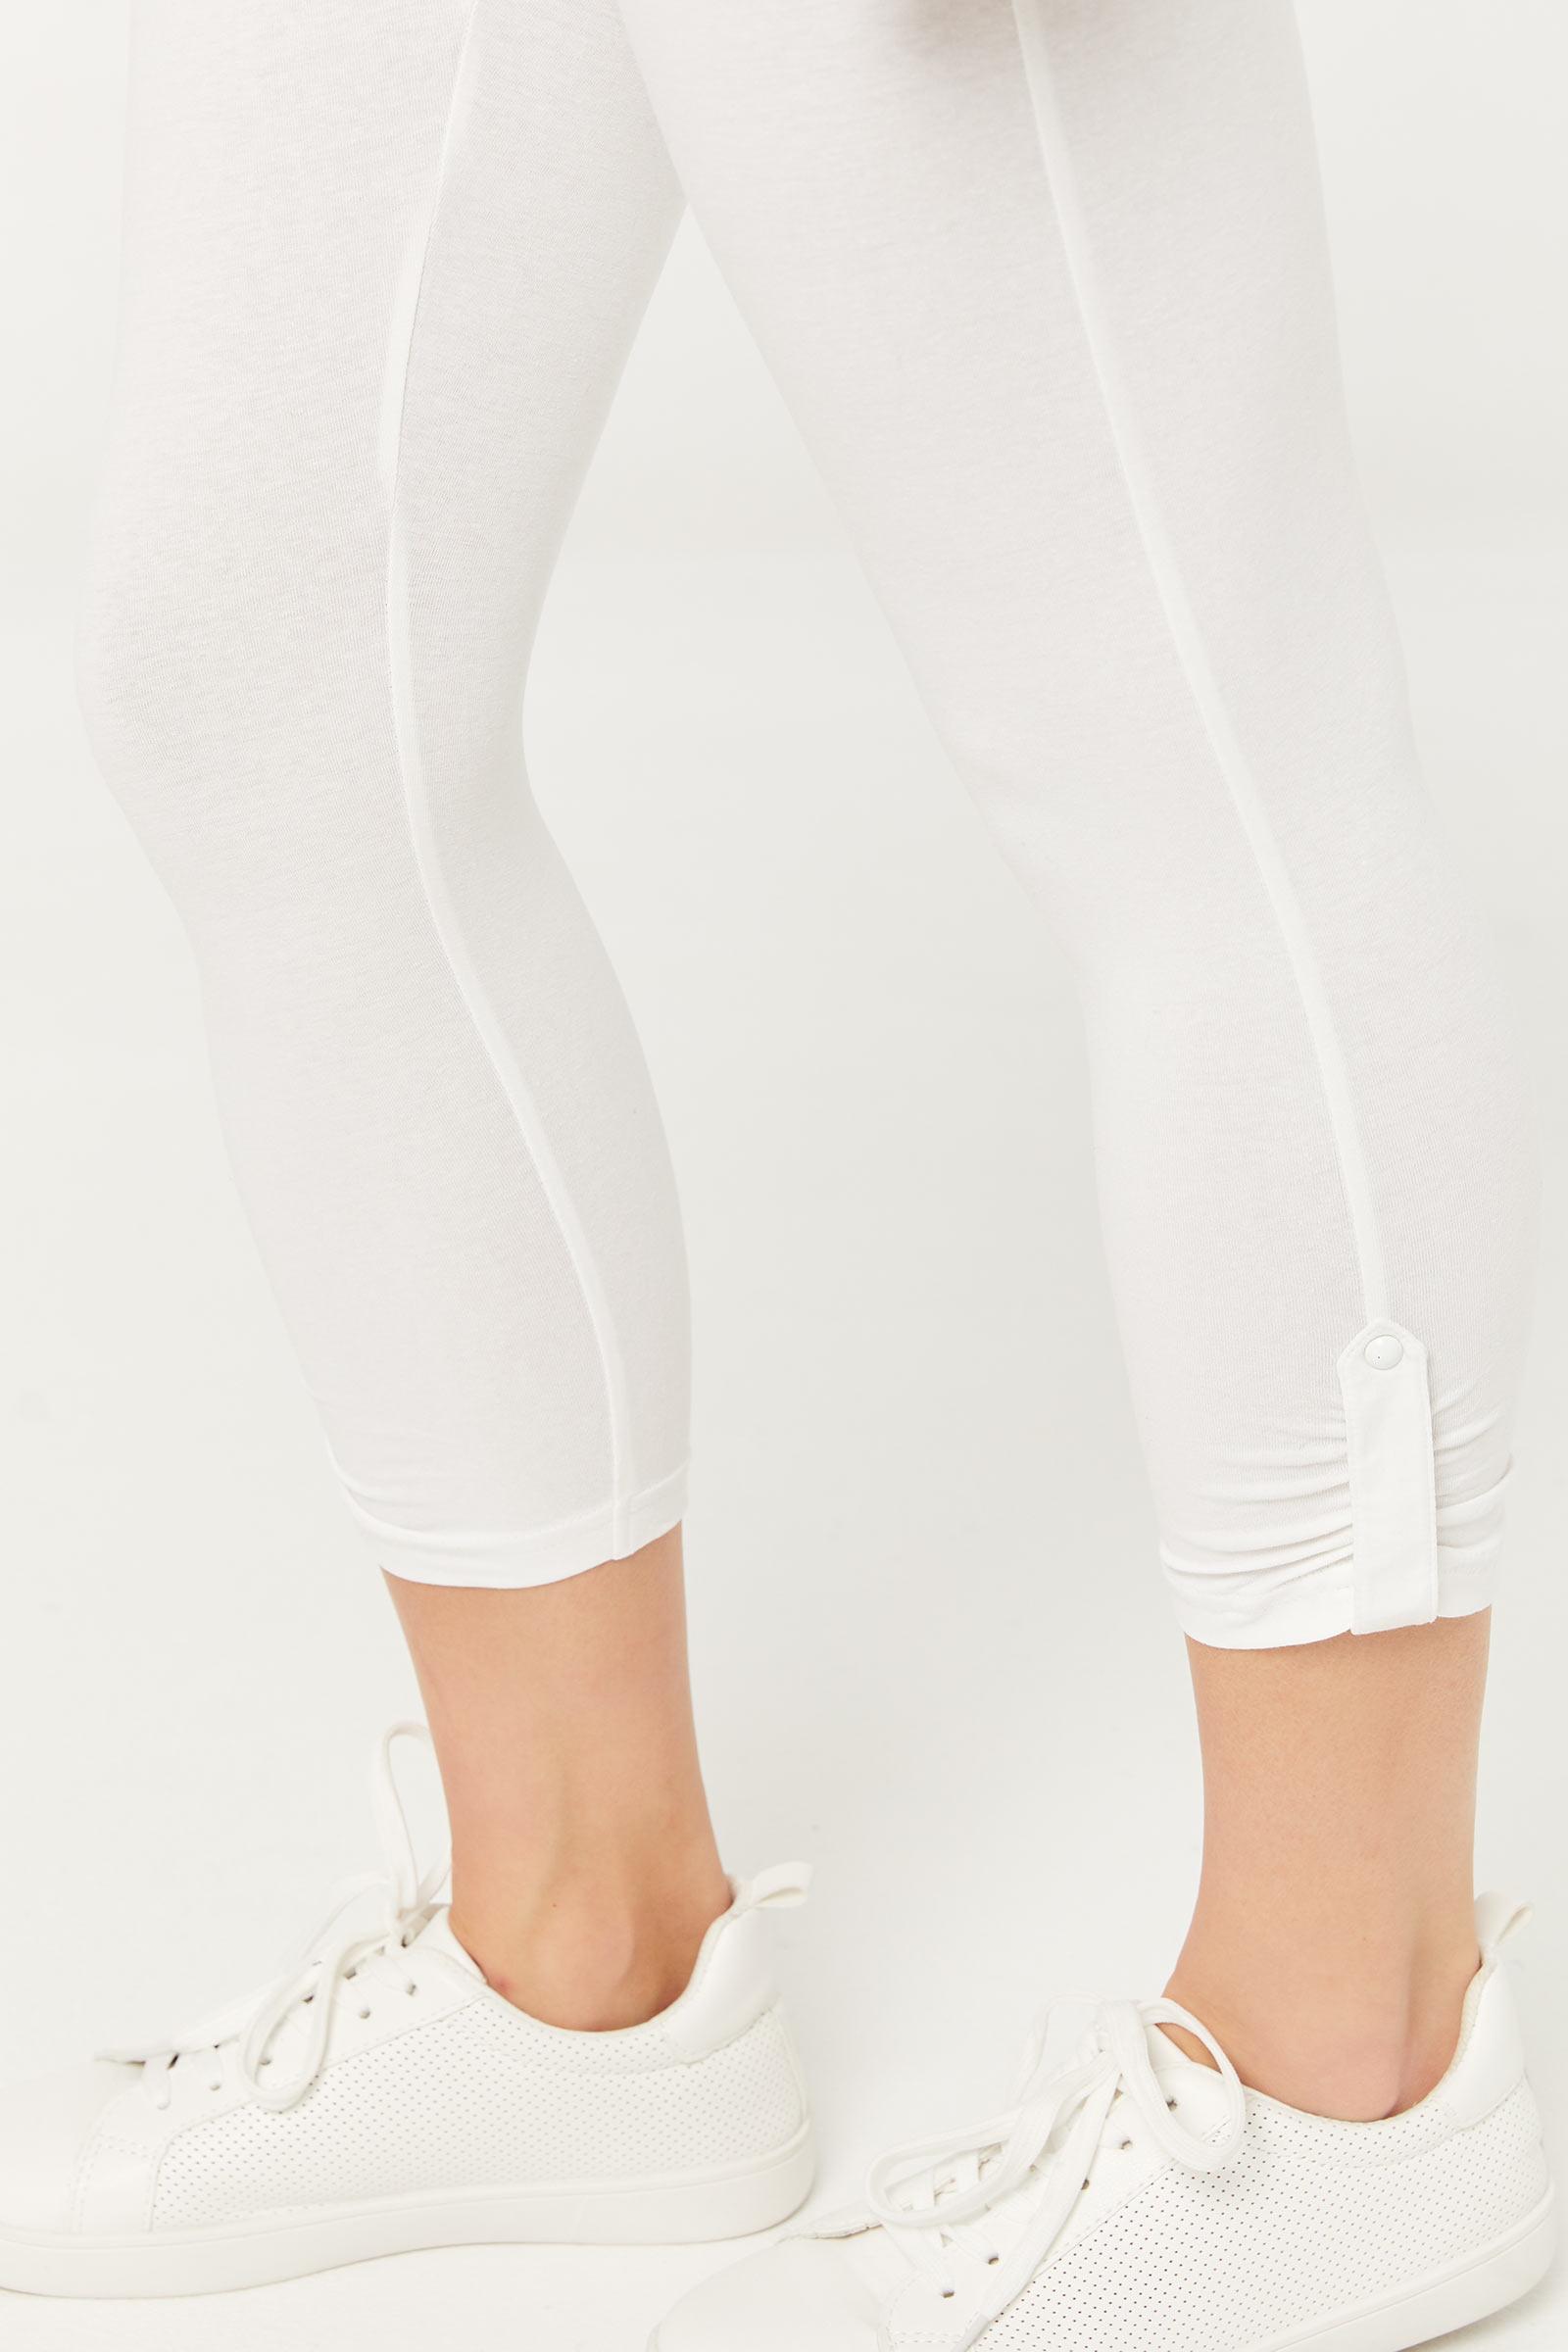 Cropped Ruched Leg Leggings